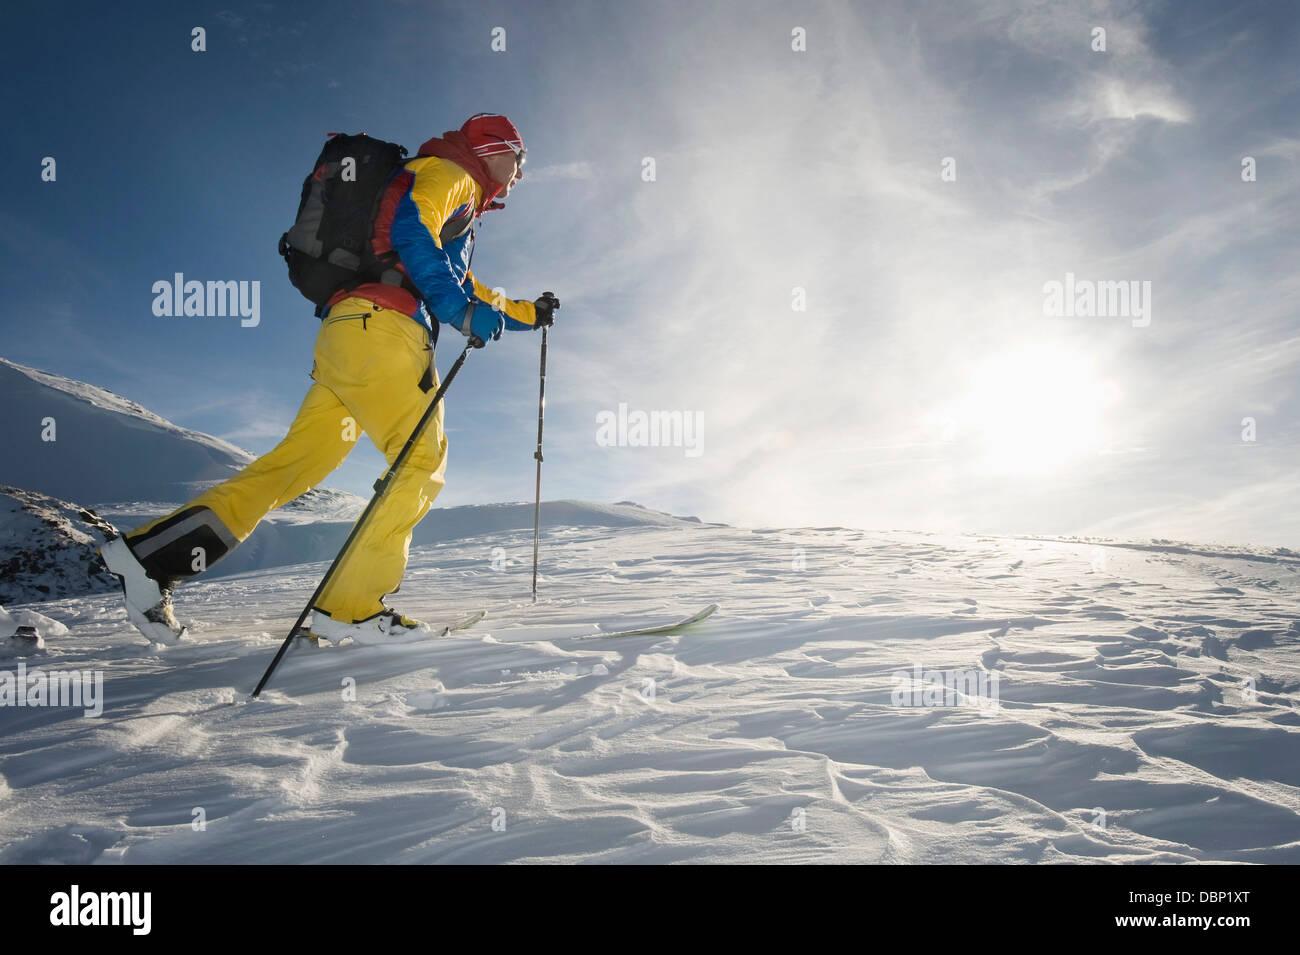 Backcountry skier on the move, Alpbachtal, Tyrol, Austria, Europe - Stock Image